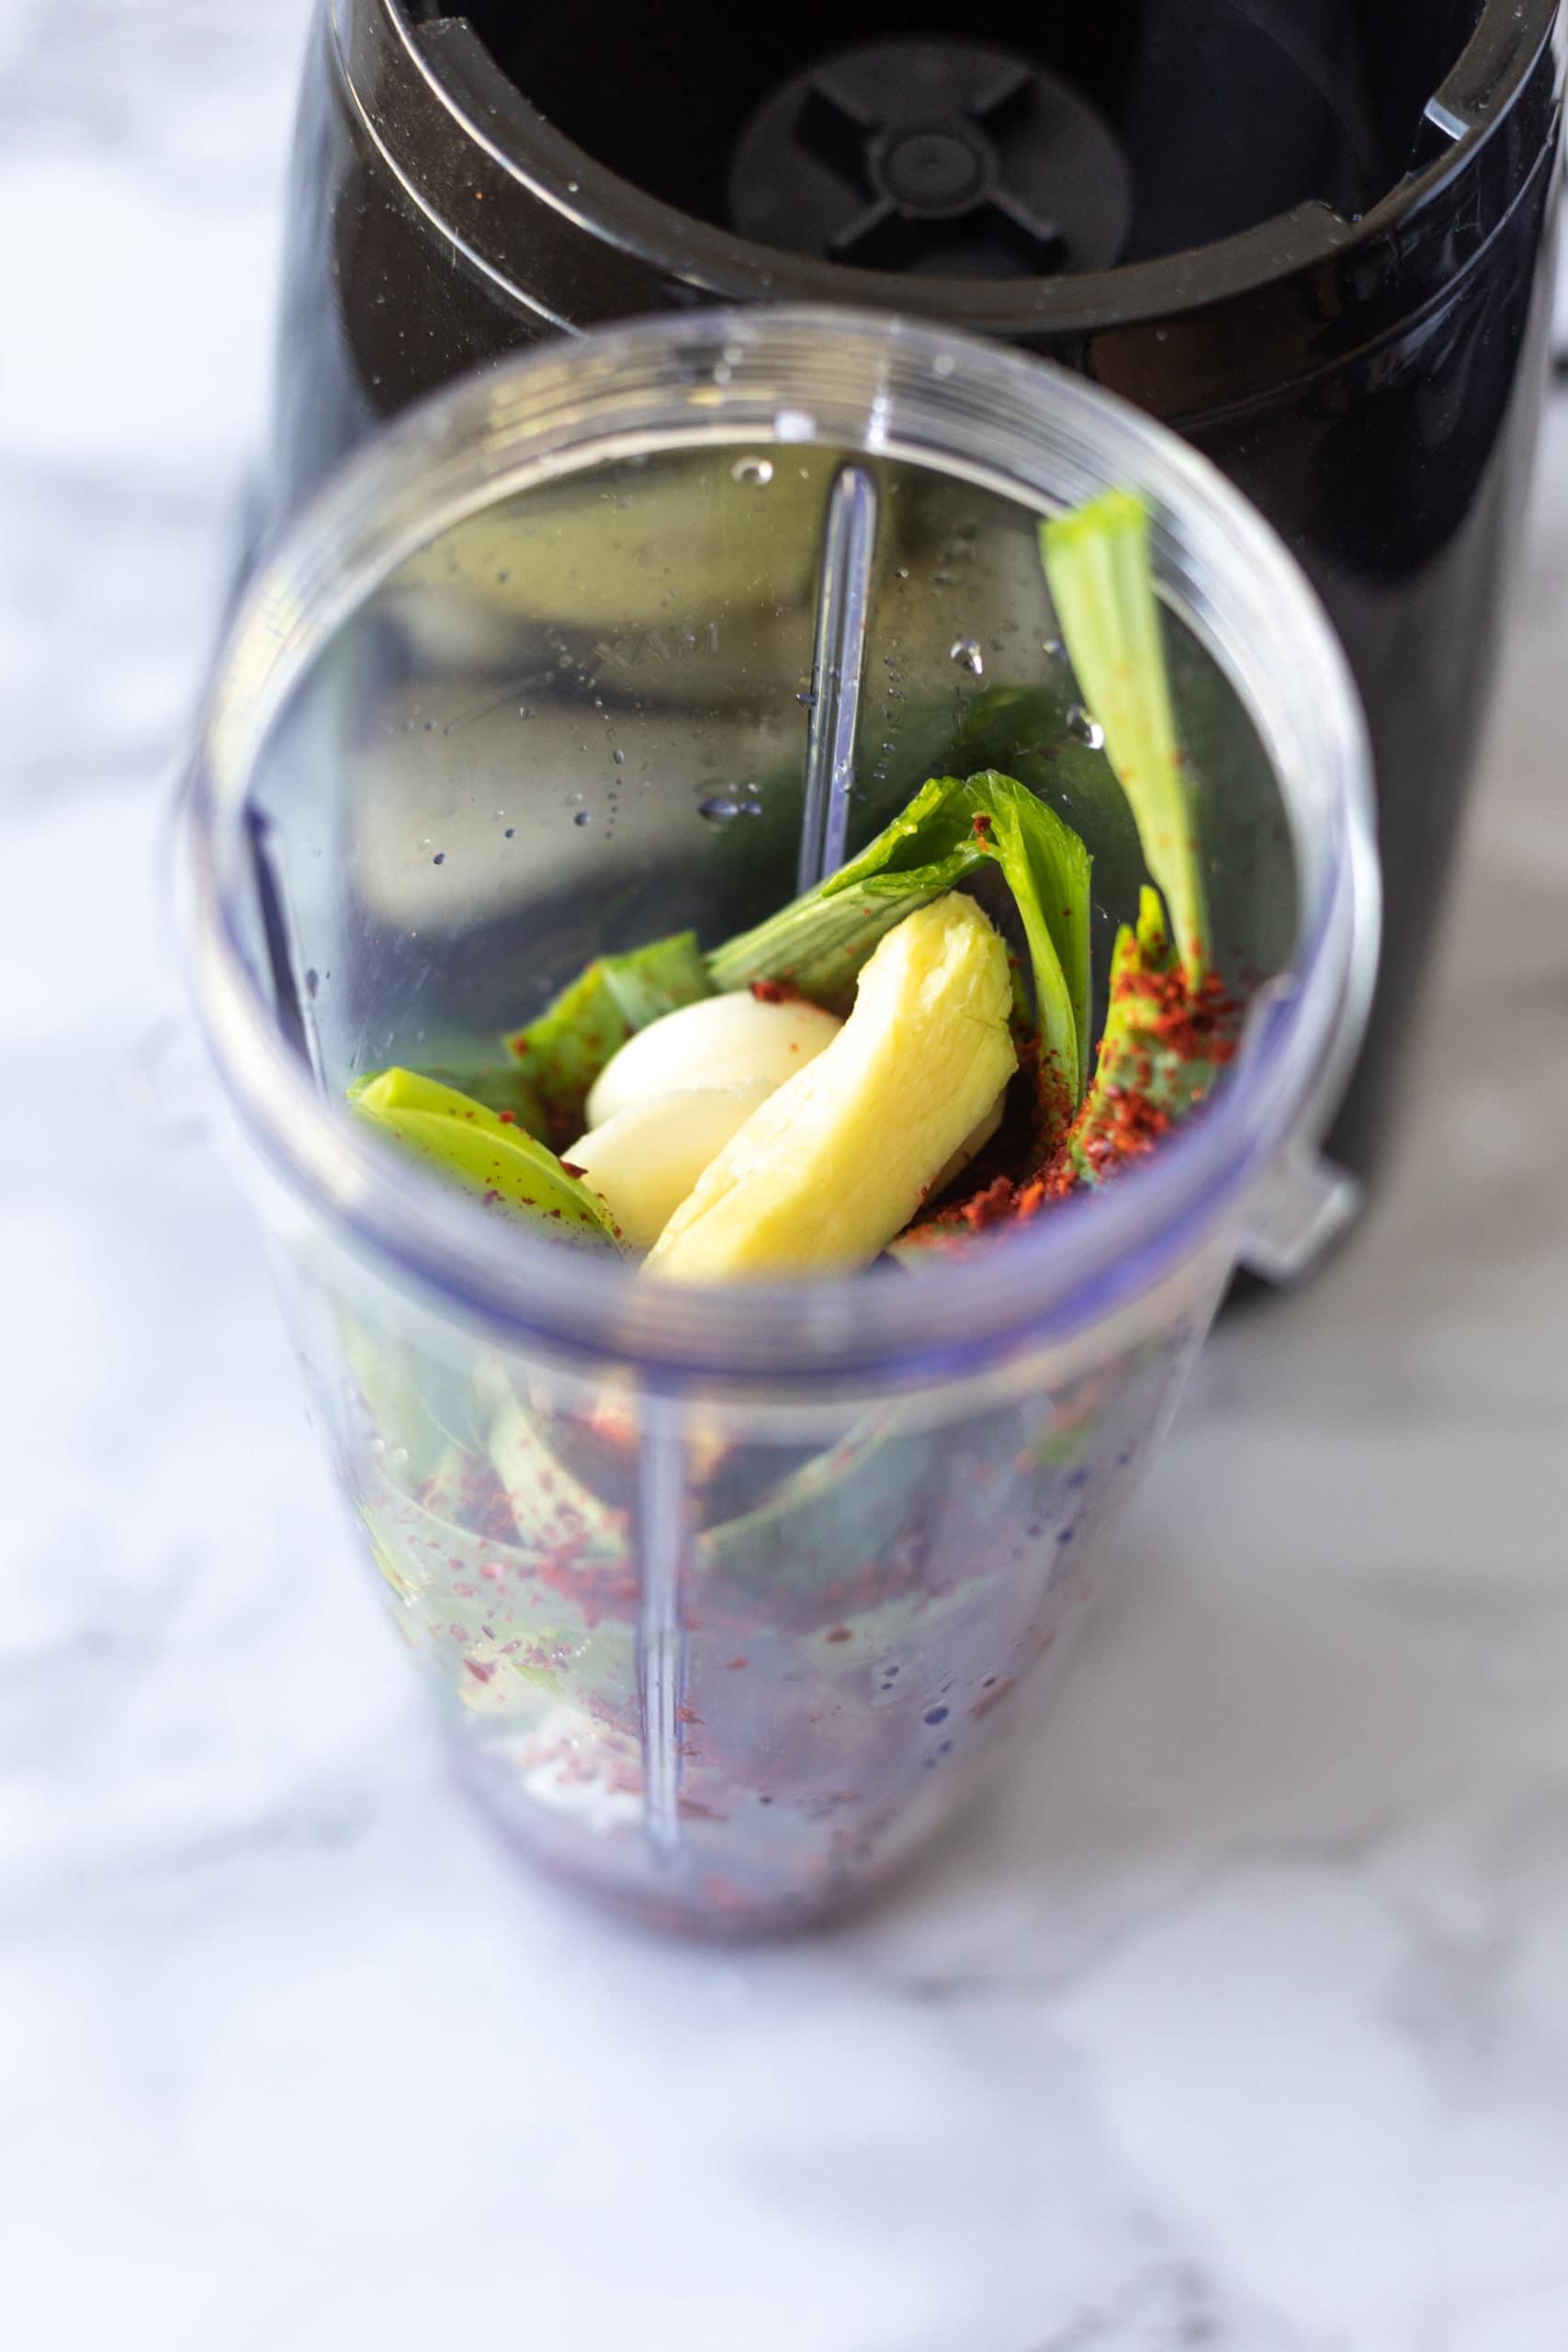 Making kimchi paste in blender with ginger, green onion, garlic, pepper